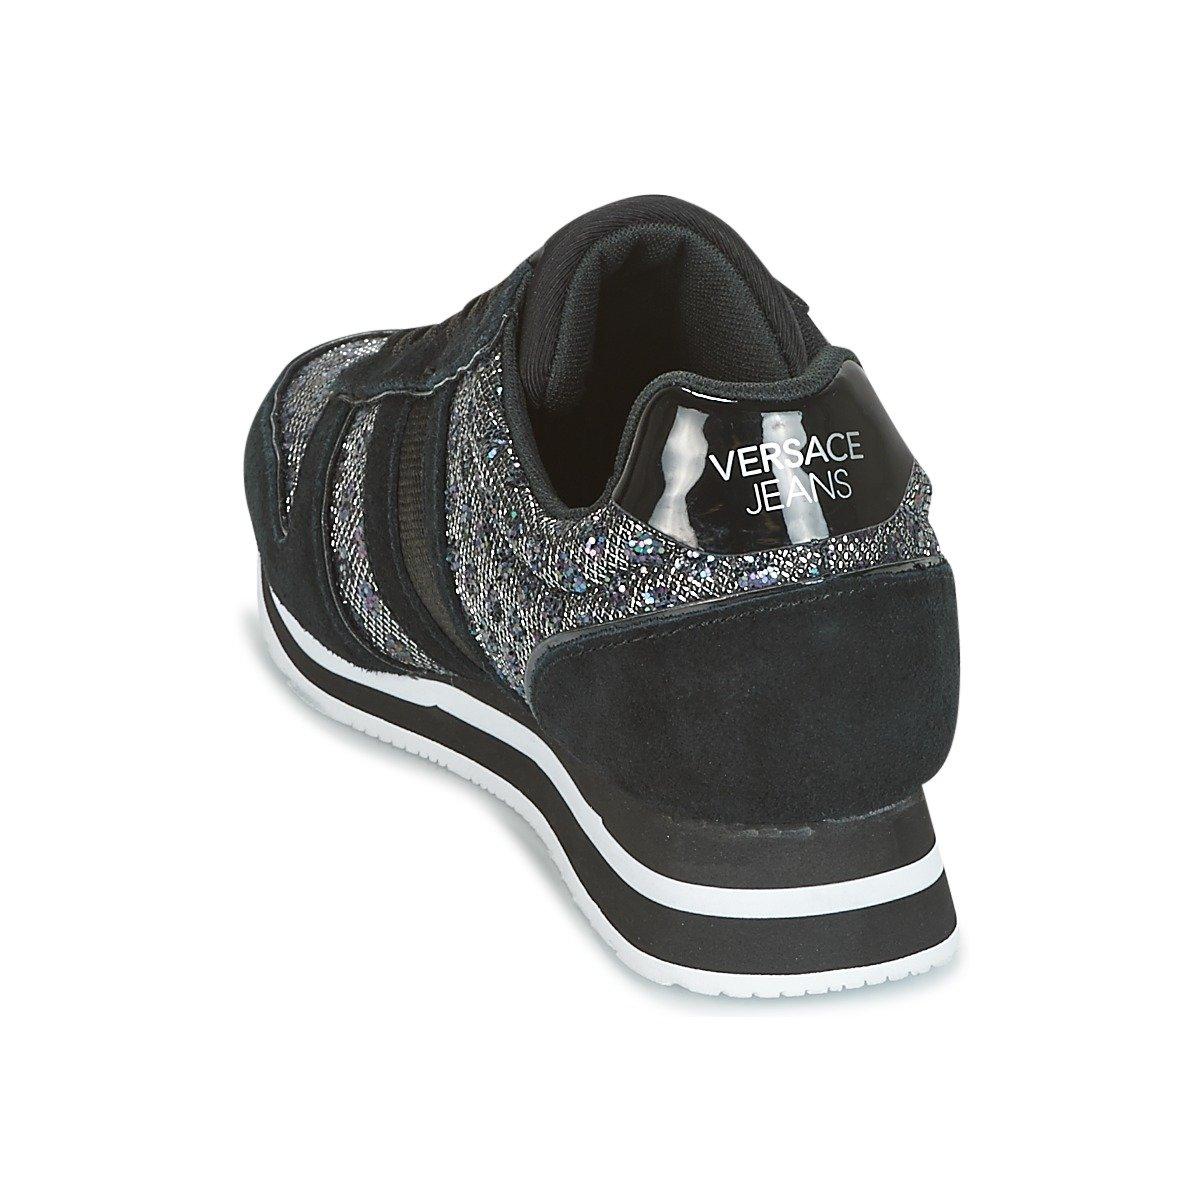 Versace Jeans Linea Fondo Stella Dis1 Suede Suede Suede Glitter Pois Textile E0VRBSA170028899 Turnschuhe 117b2e